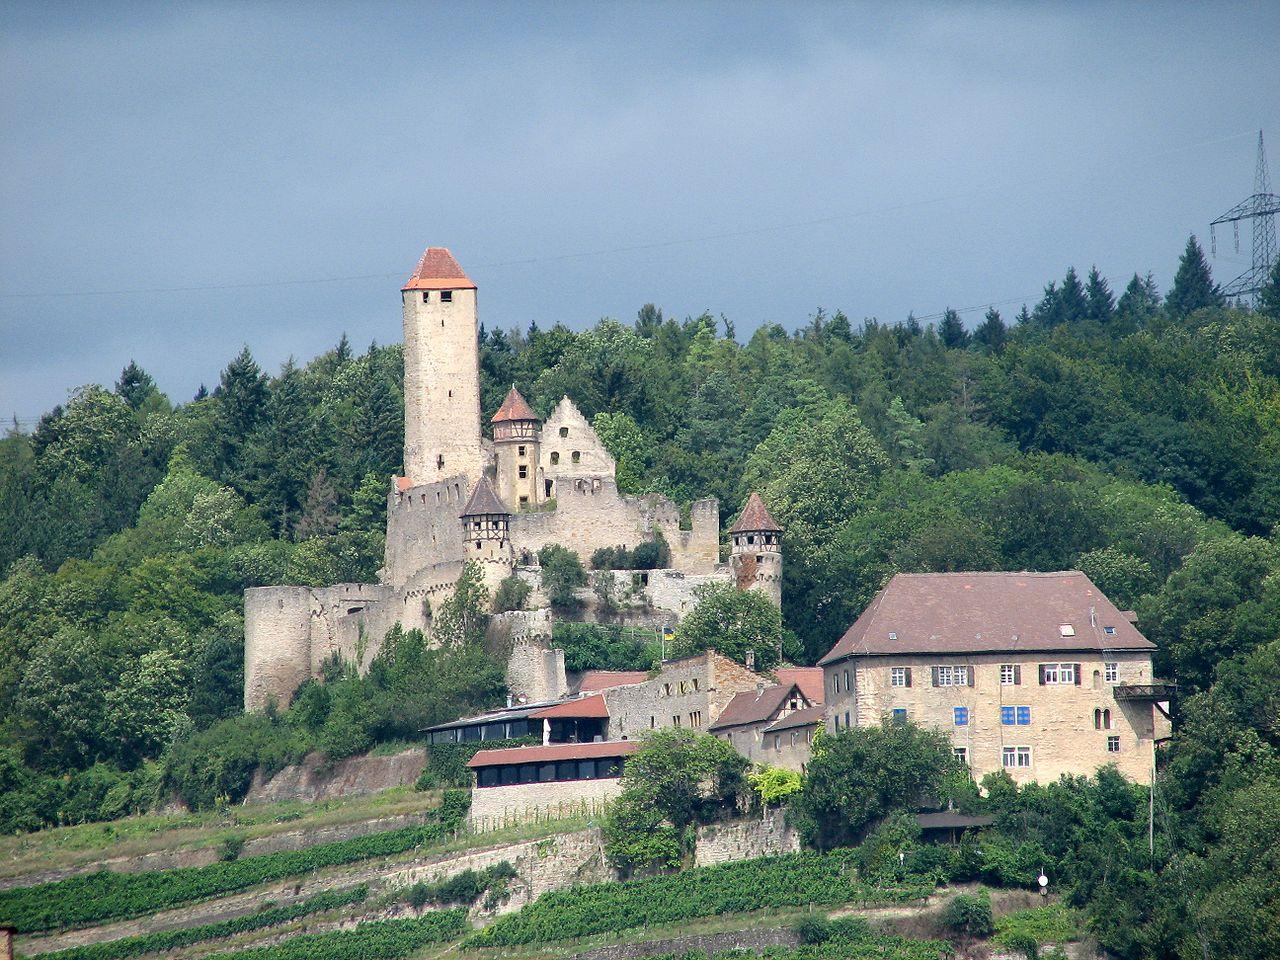 Bild Burg Hornberg Neckarzimmern